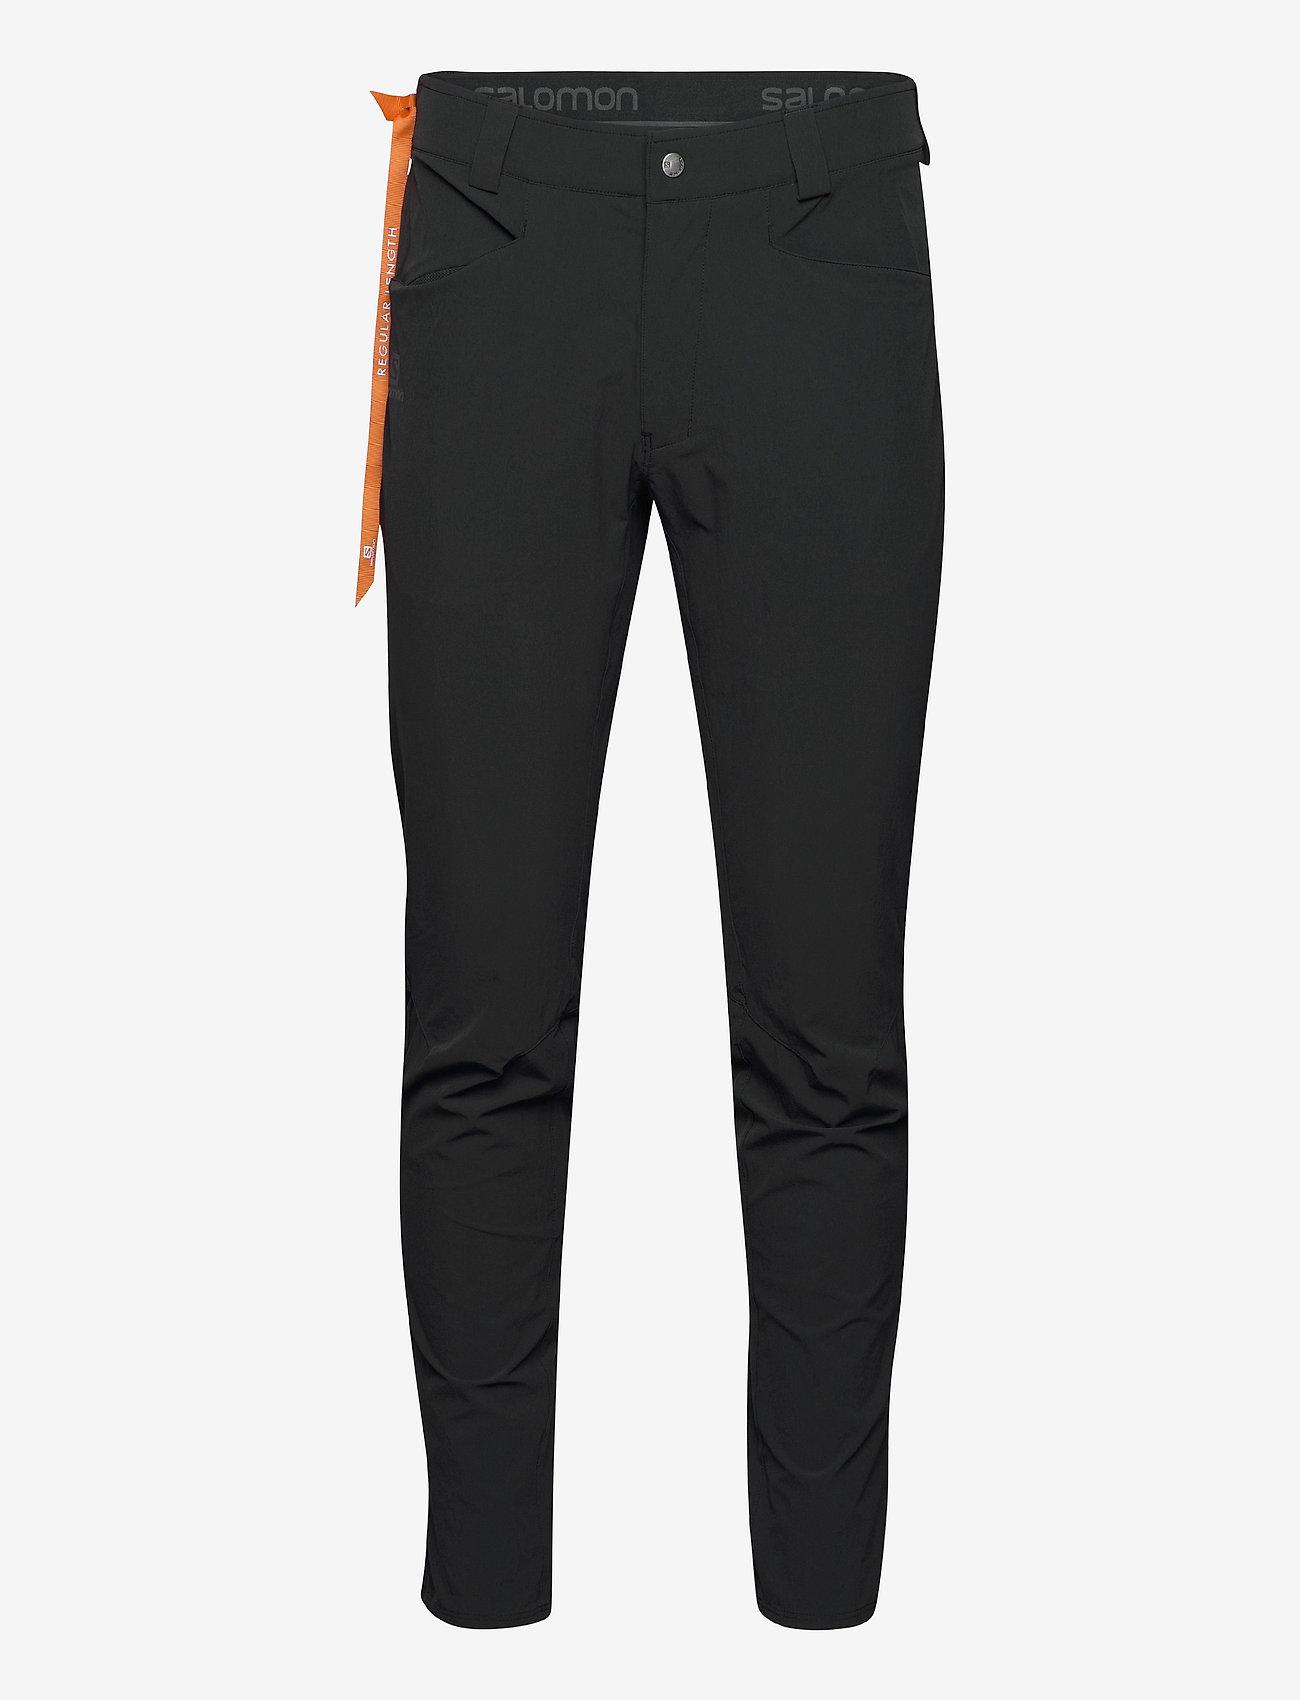 Salomon - WAYFARER TAPERED PANTS M Black - outdoorbukser - black - 0